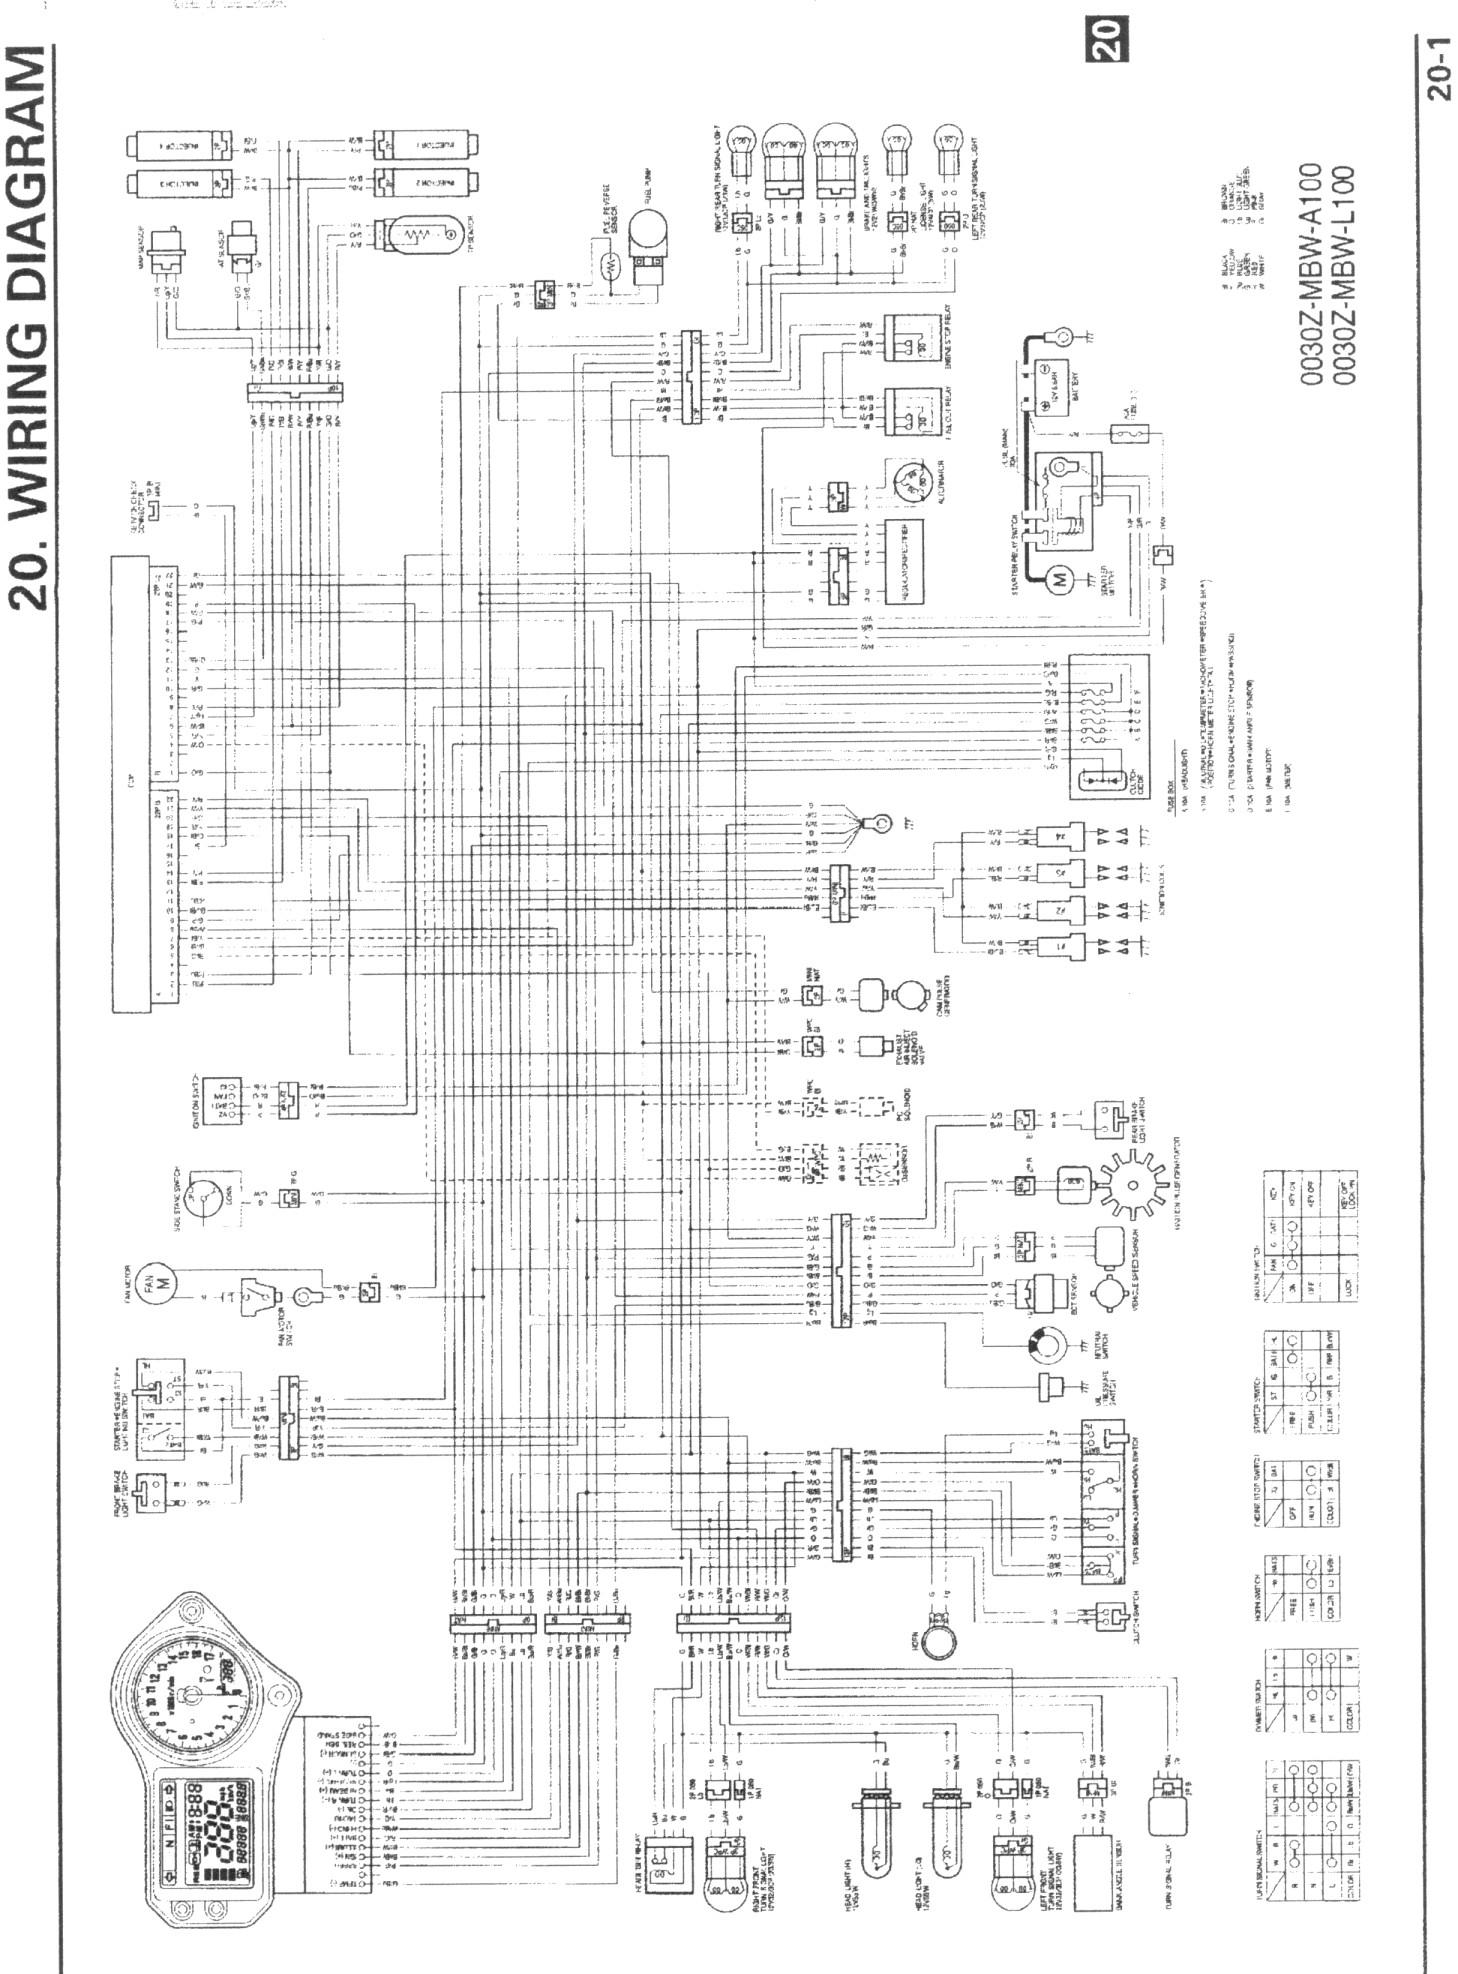 cbr 600 f4i wiring diagram polaris ranger kayak rack data honda best library zx12